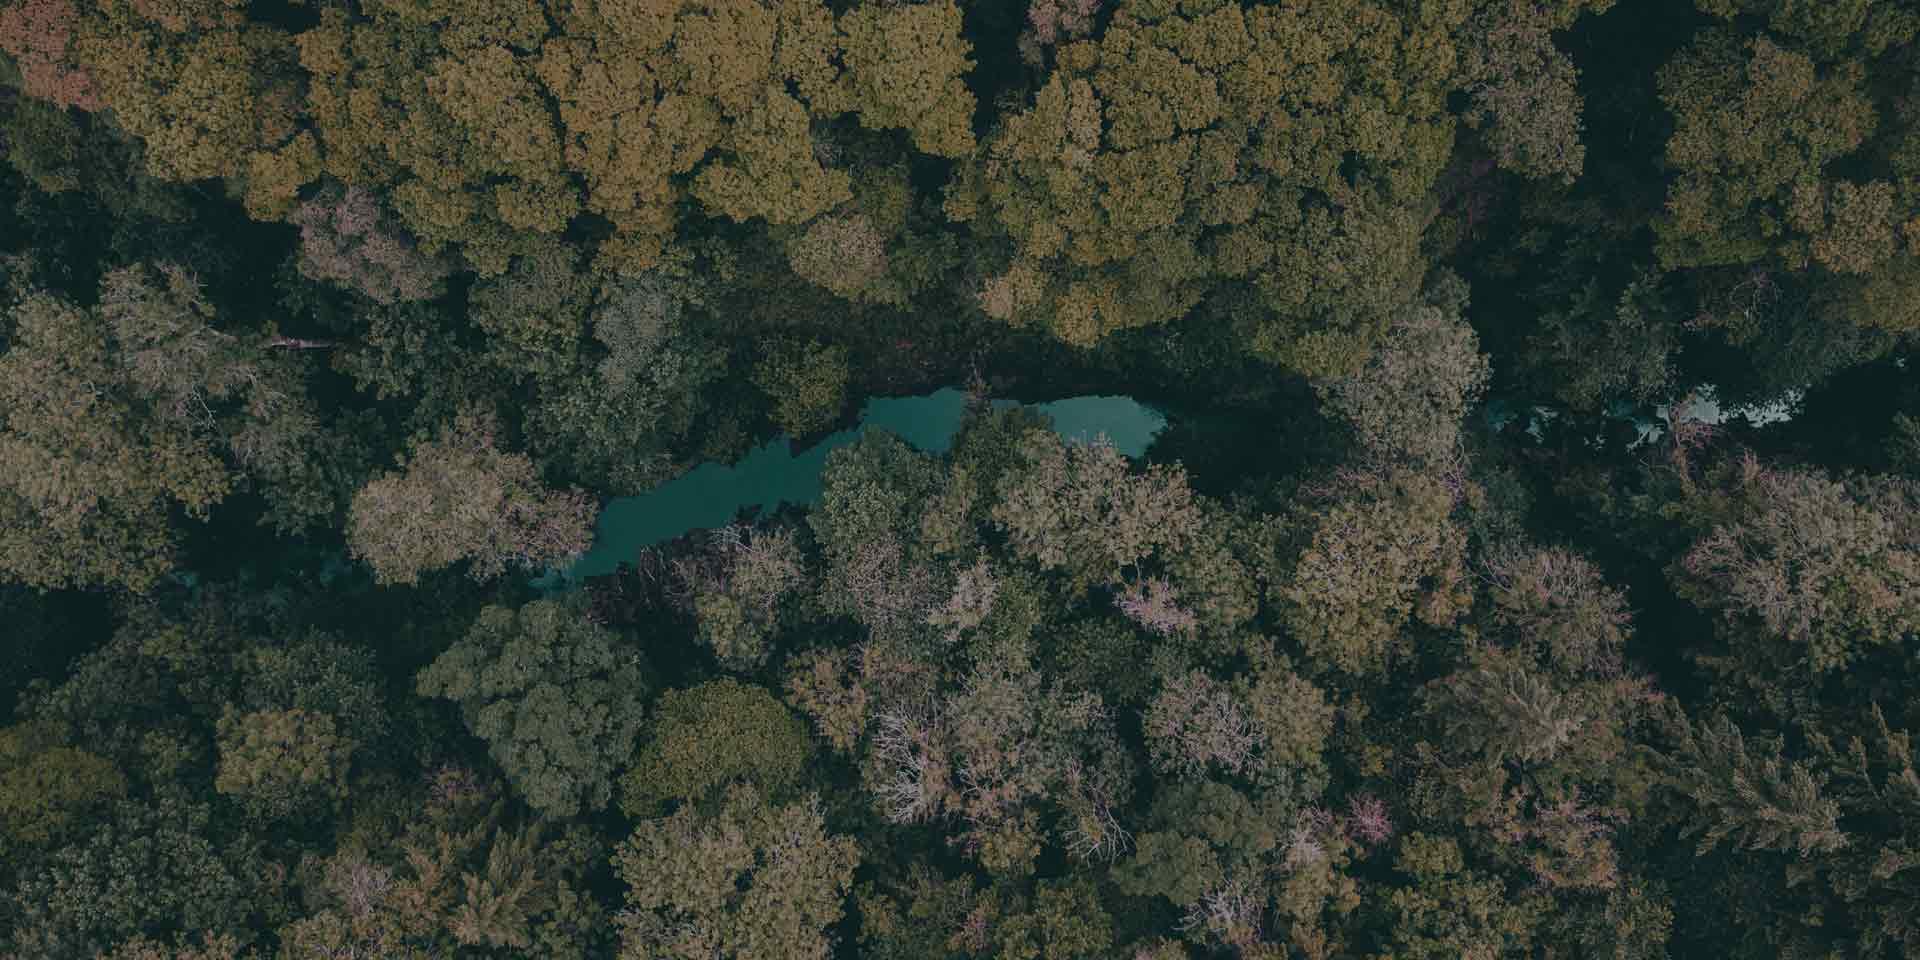 homepage-thefutureforestcompany-trees